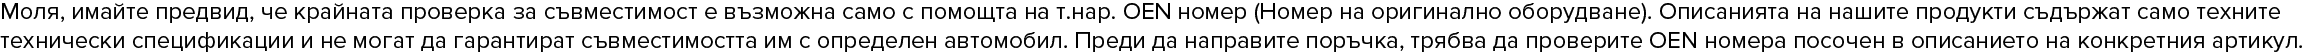 WAHLER 646 140 04 60, 646 140 07 60 AGR-Клапан